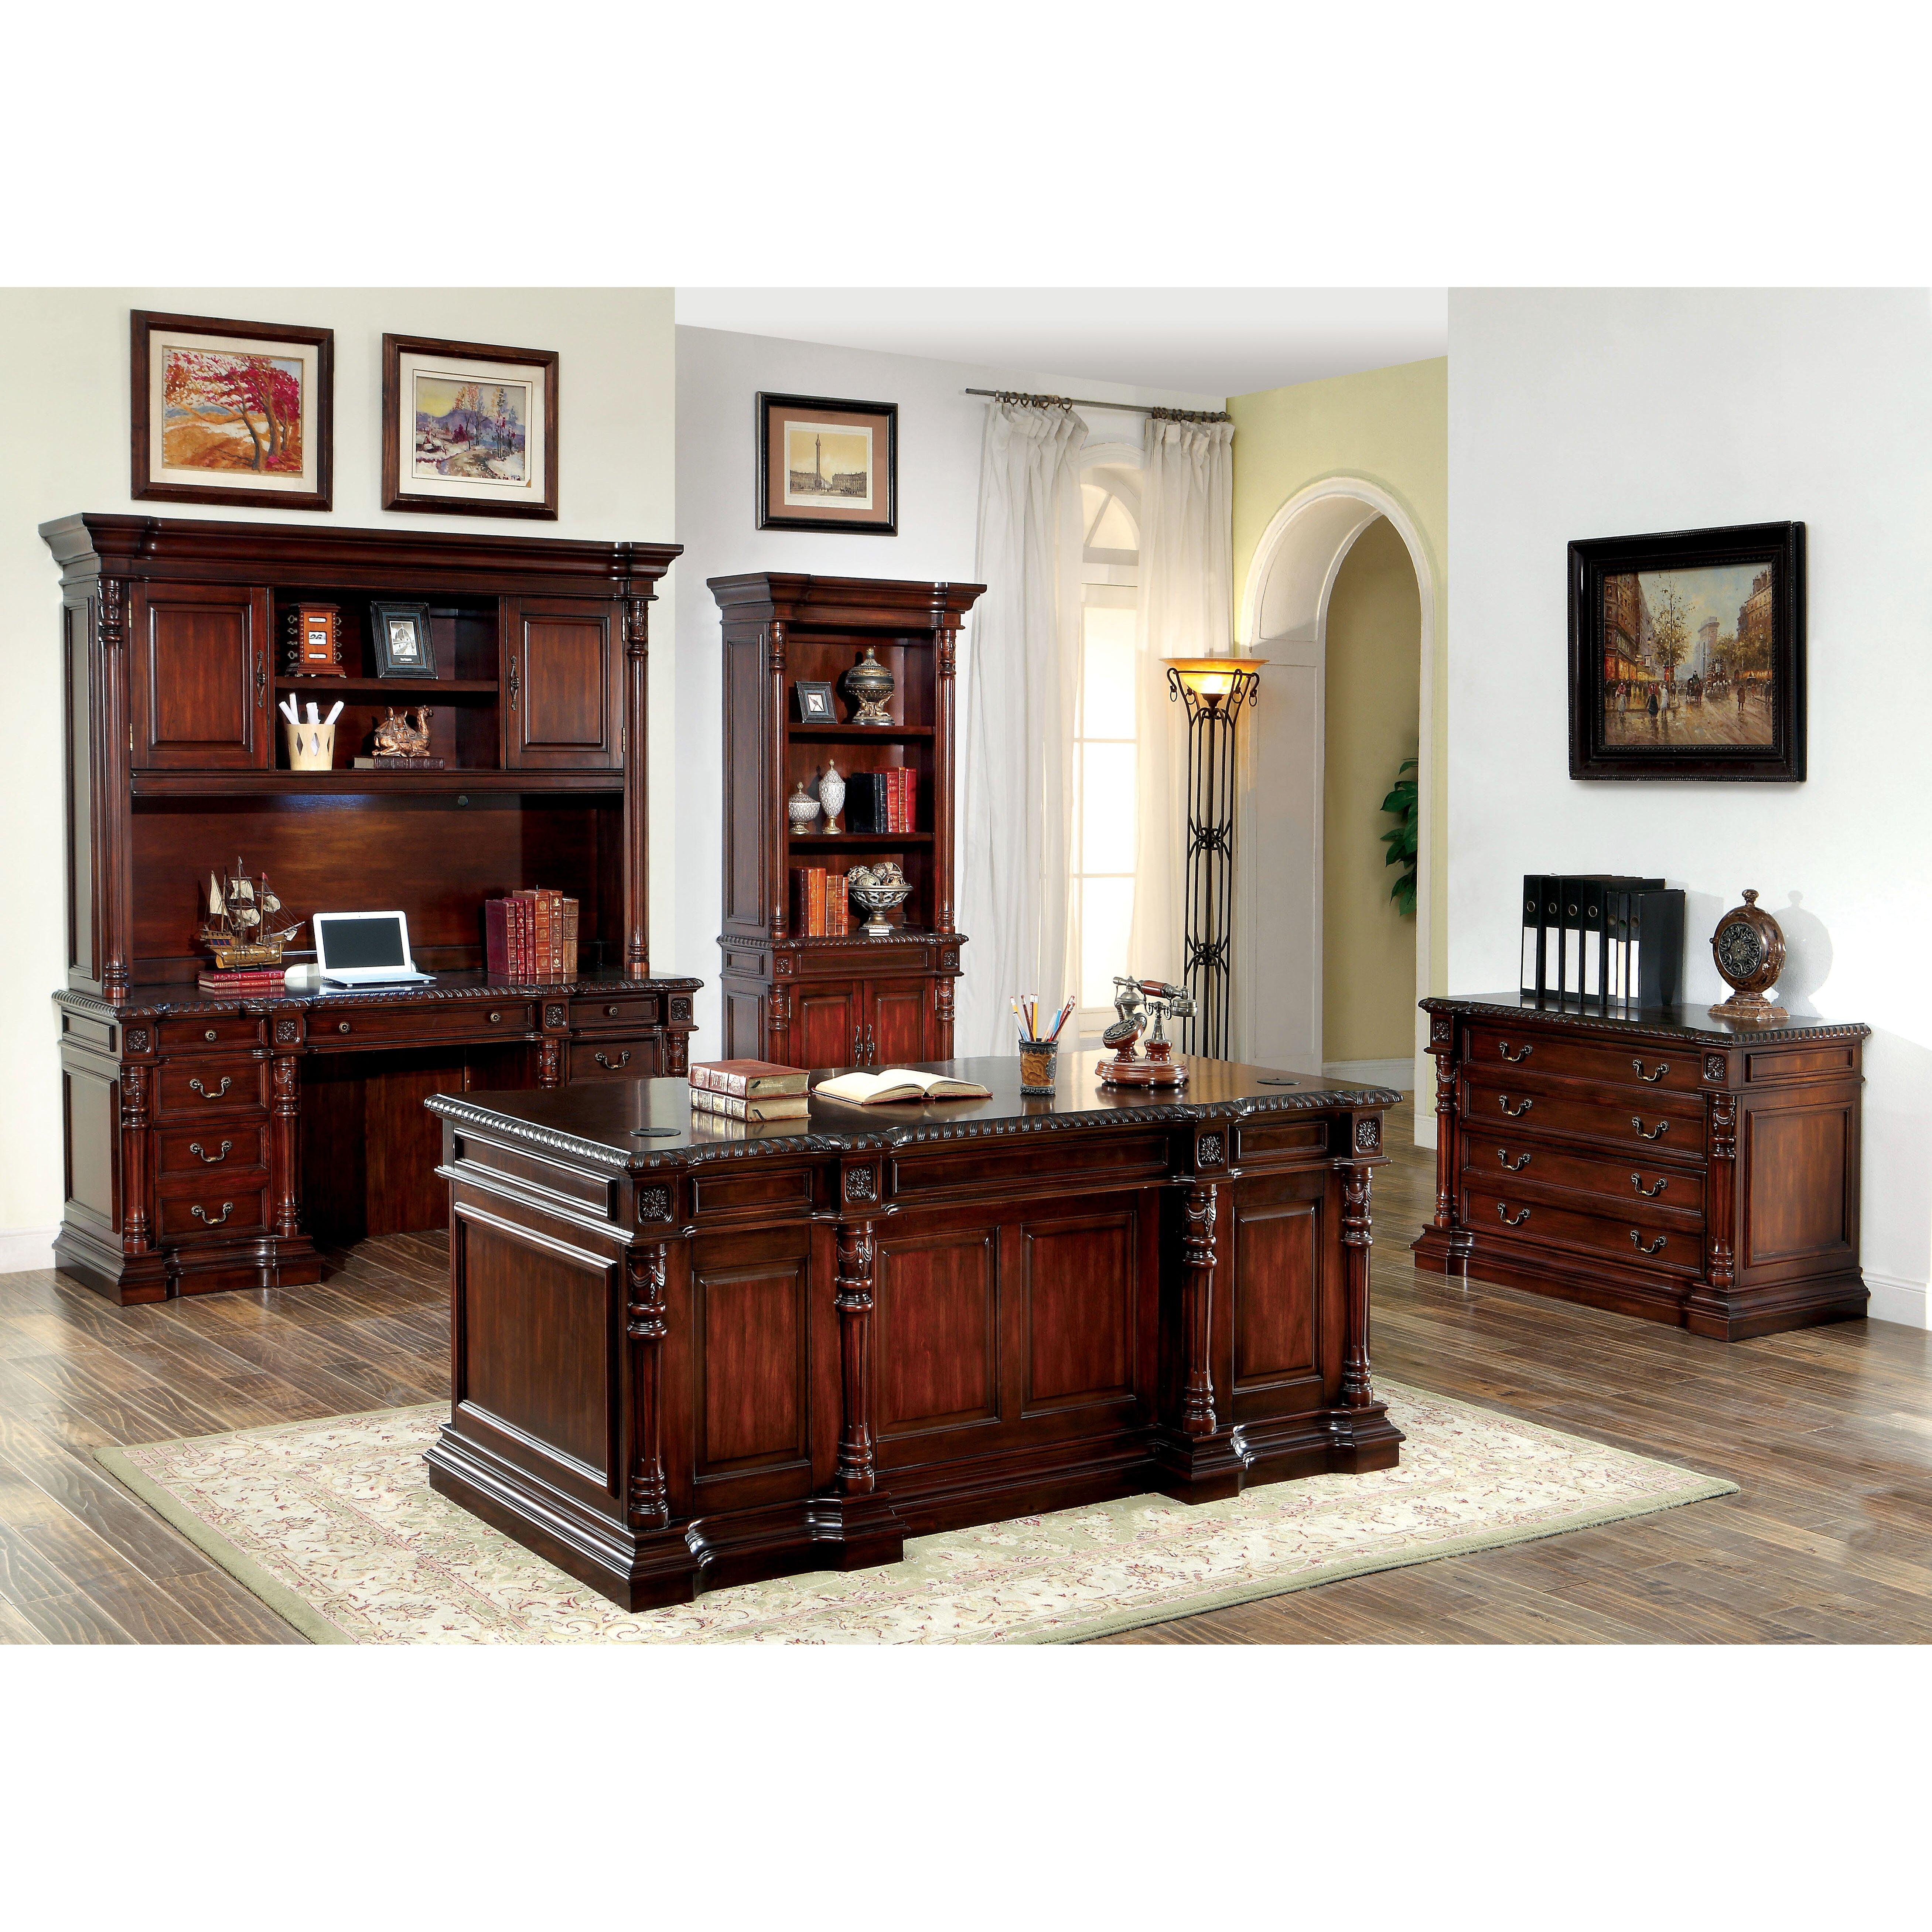 Aspenhome Warm Cherry Executive Modular Home Office: Astoria Grand Eastpointe Executive Desk